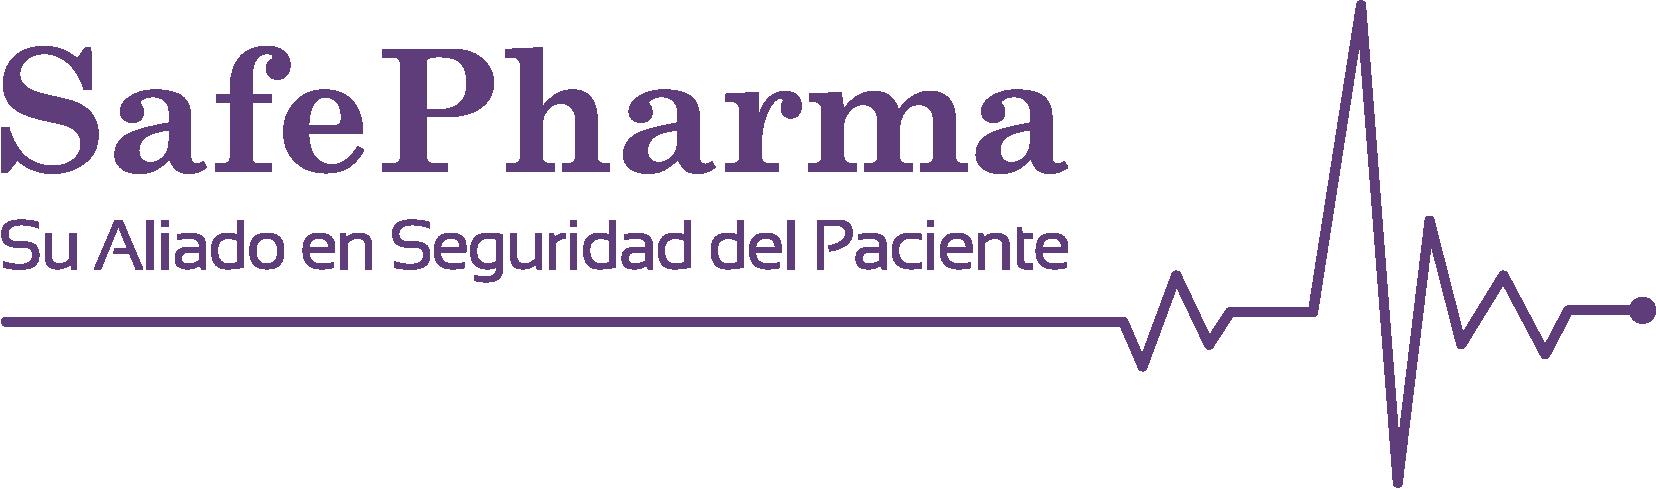 Logotipo Safepharma